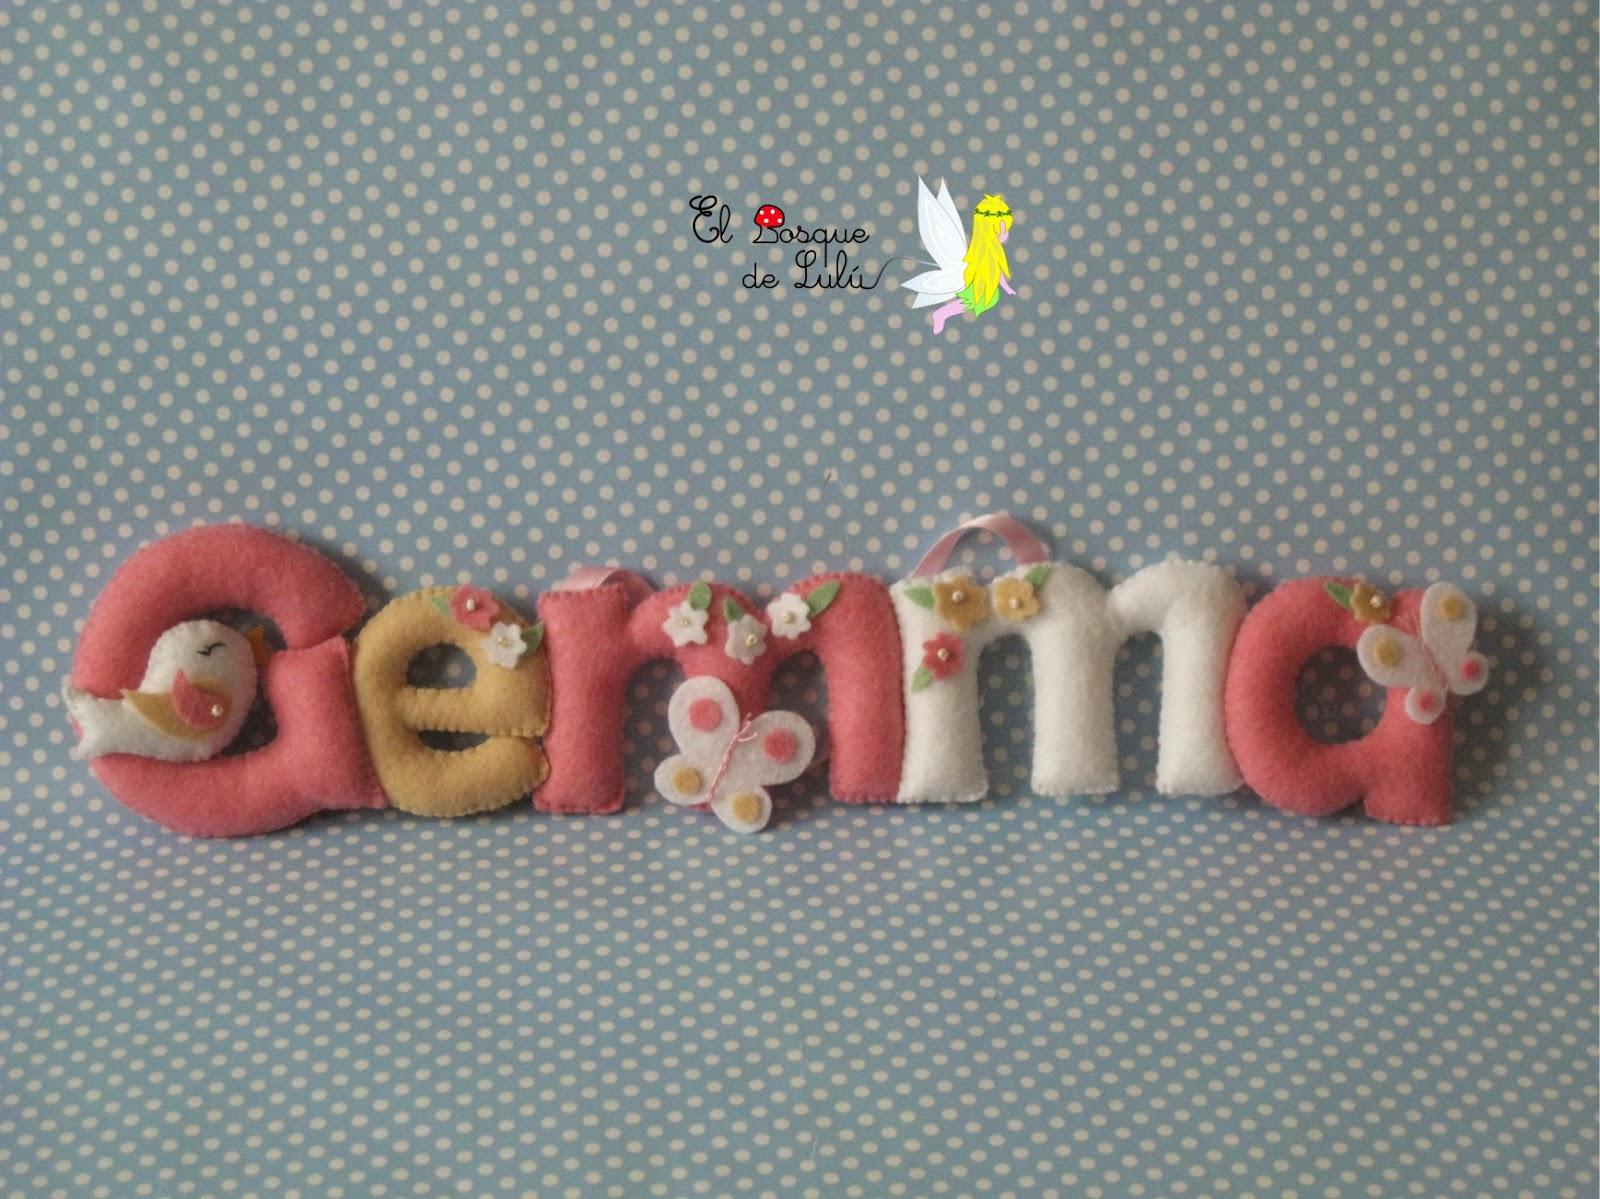 nombre-decorativo-fieltro-name-banner-infantil-decoración-nacimiento-Gemma